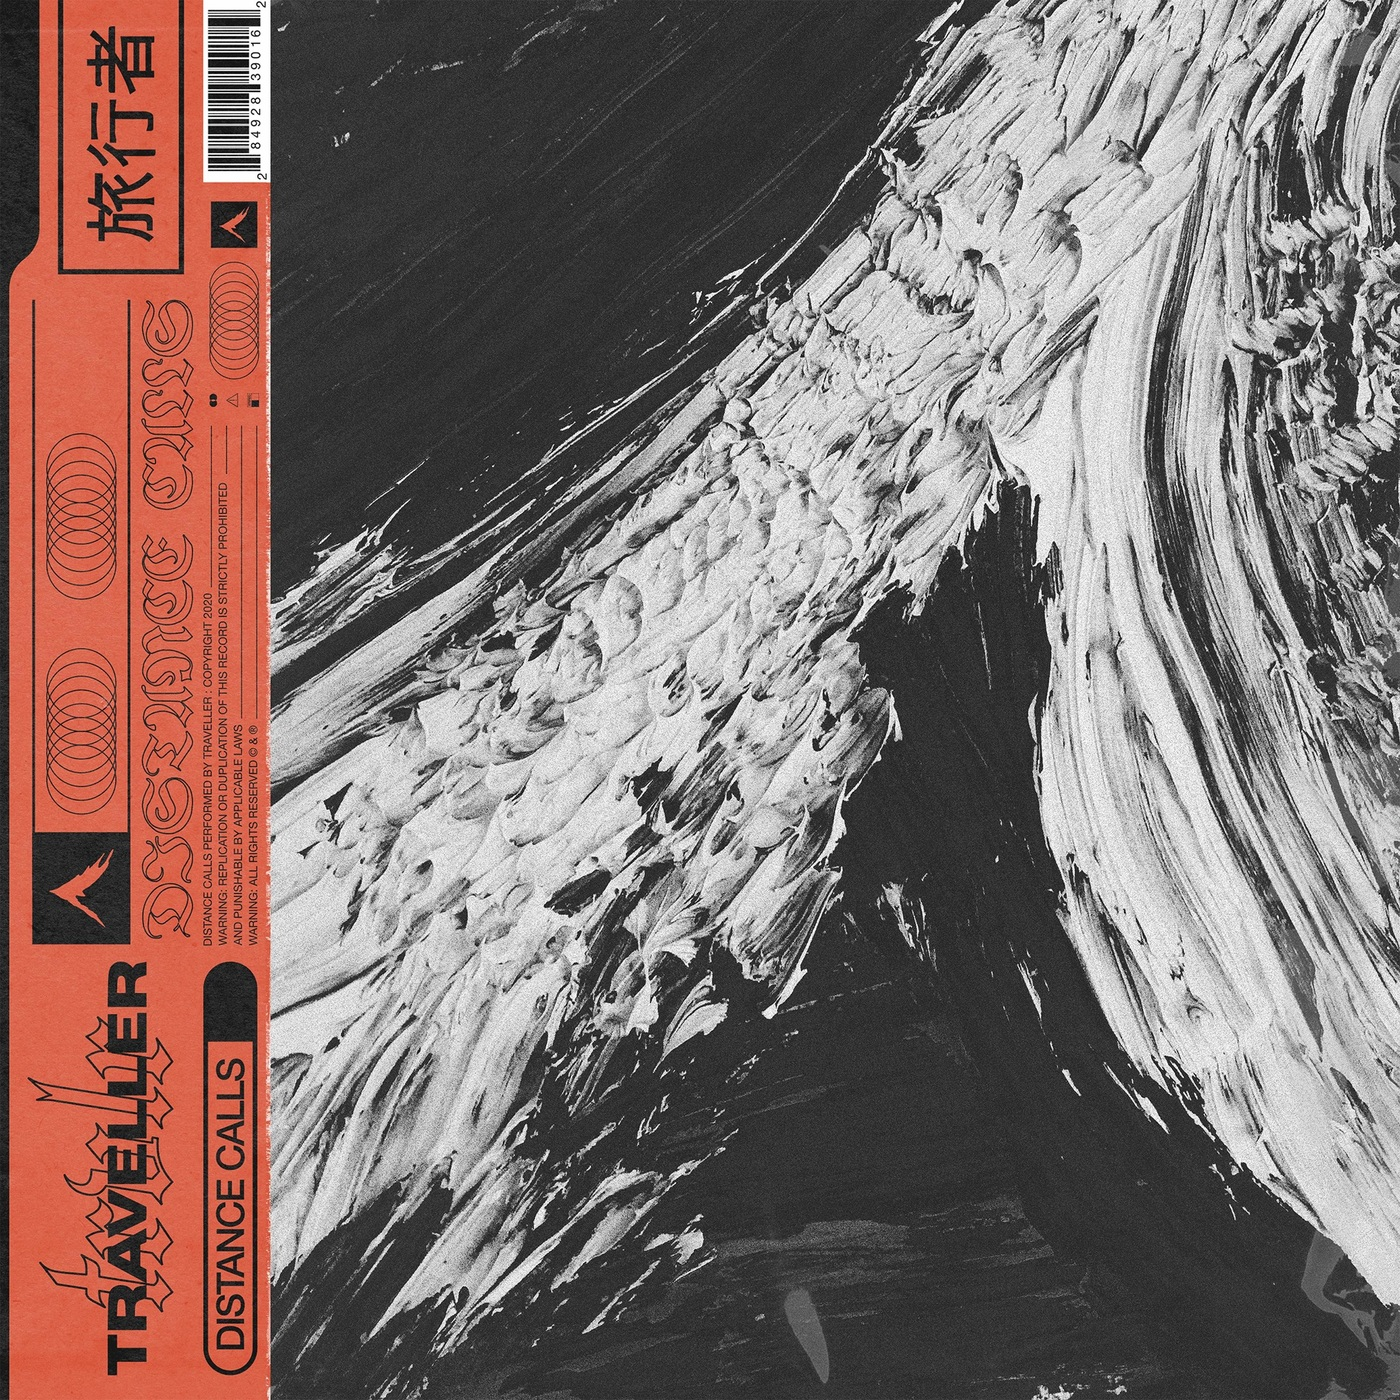 Traveller - Distance Calls [EP] (2021)